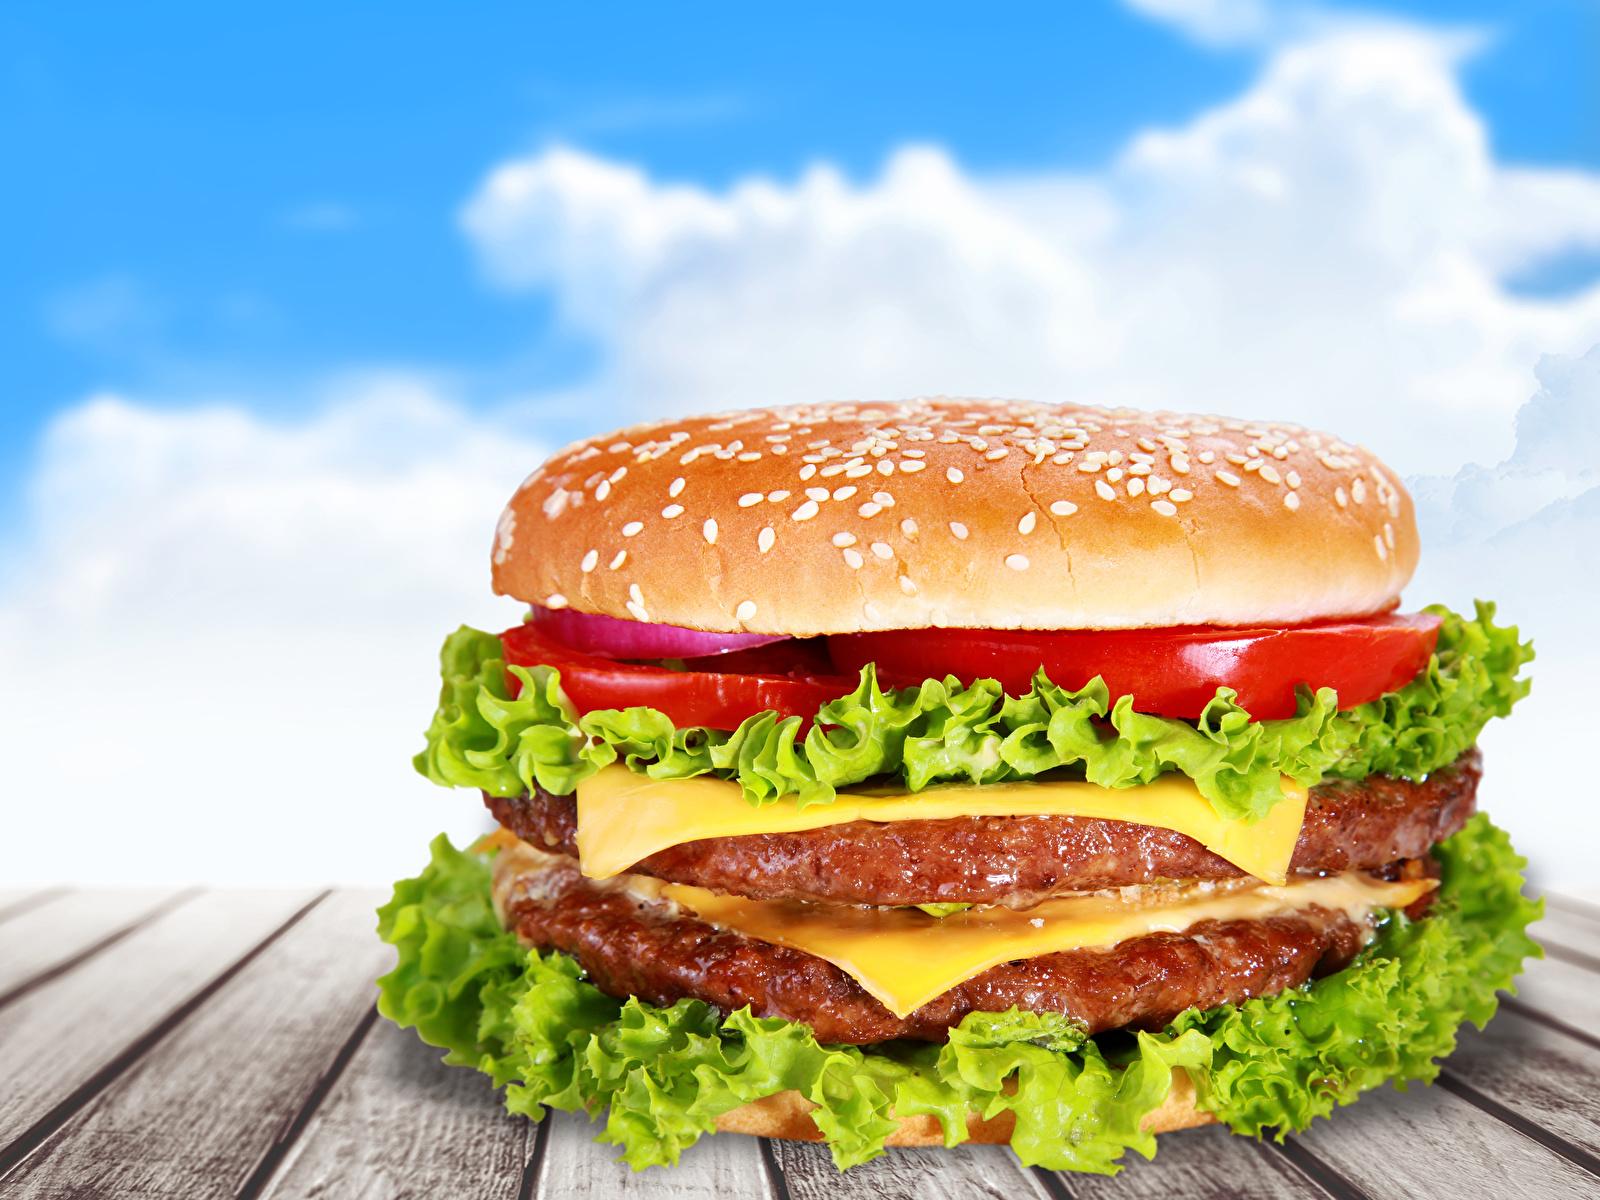 Fotos Hamburger Fast food Gemüse Lebensmittel Bretter 1600x1200 Burger